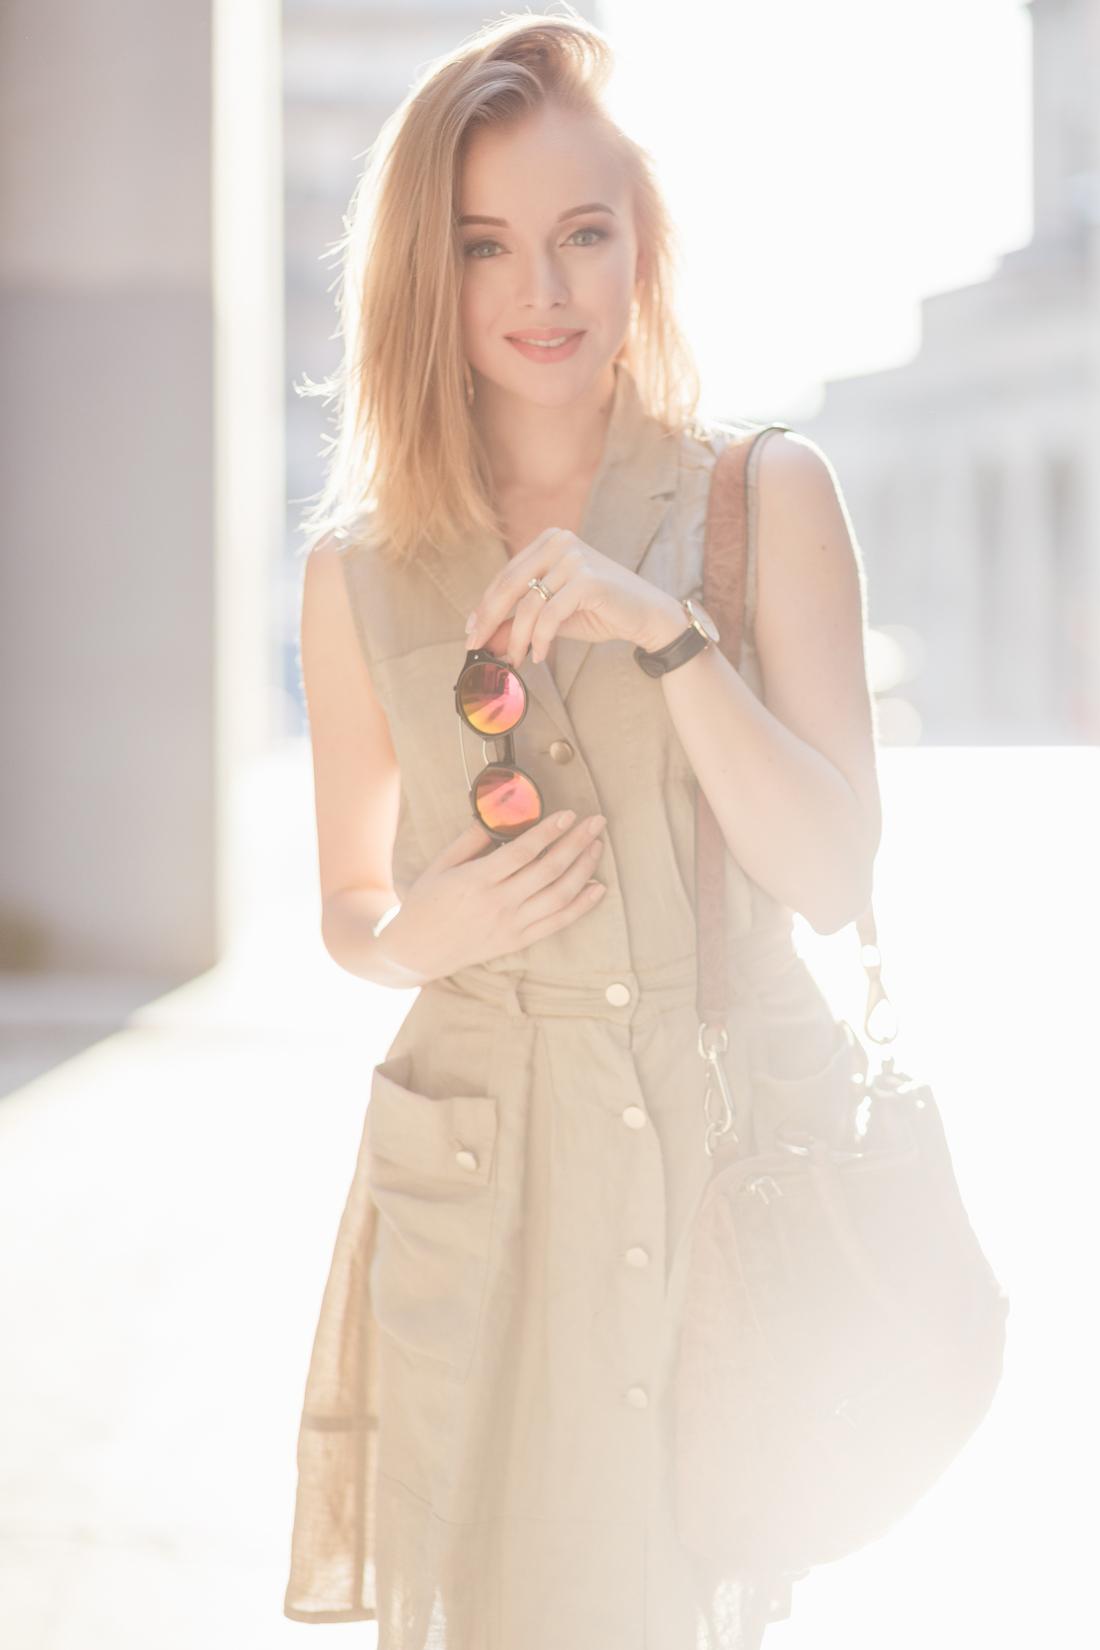 darya kamalova thecablook fashion lifestyle russian italian blogger wears stefanel dress schutz gladiators and giverchy pandora bag-13